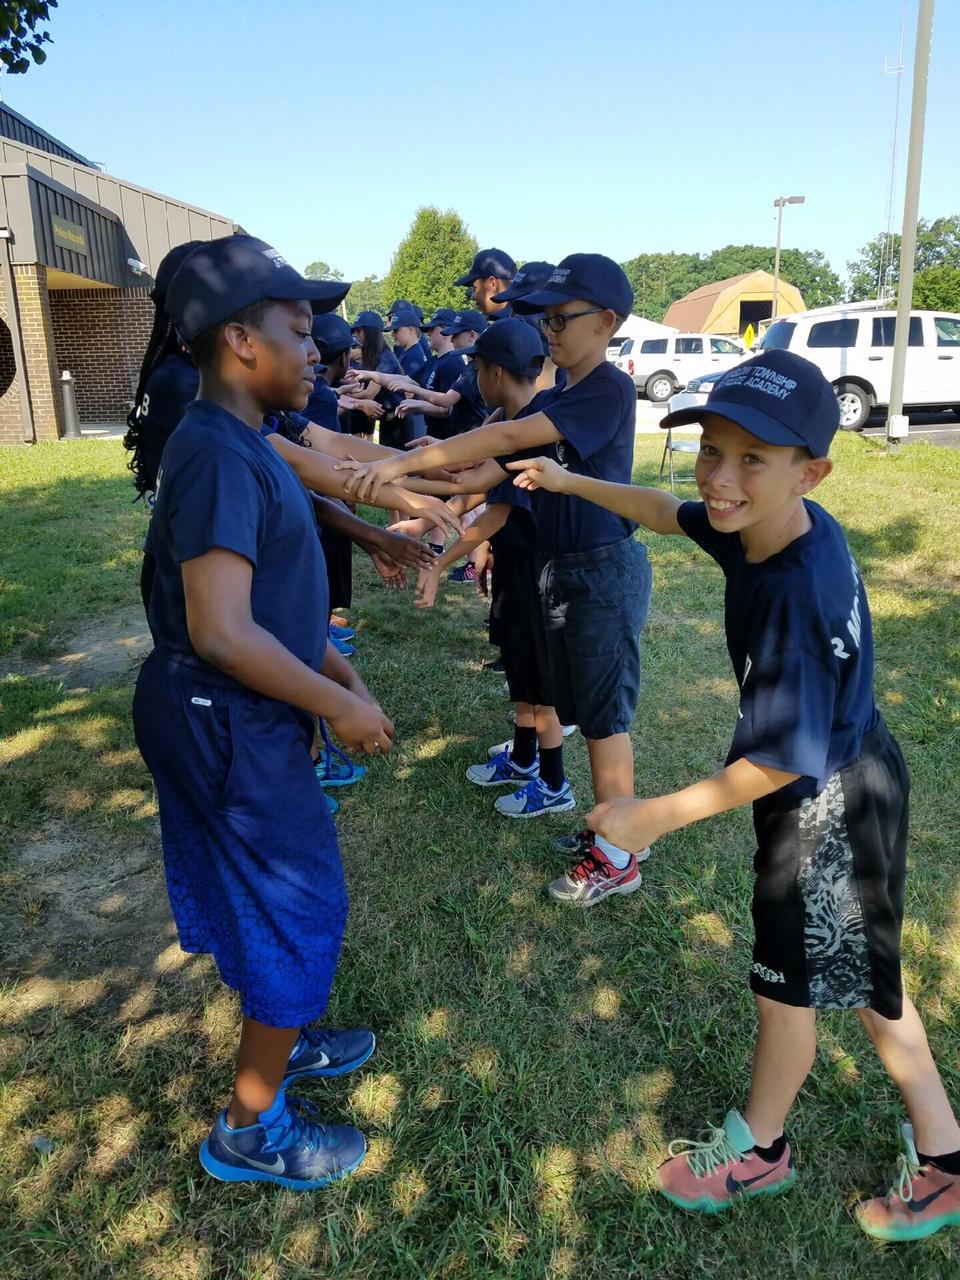 Winslow Township Junior Police Academy Graduation Ceremonies Friday Cnbnews Net Gloucester City